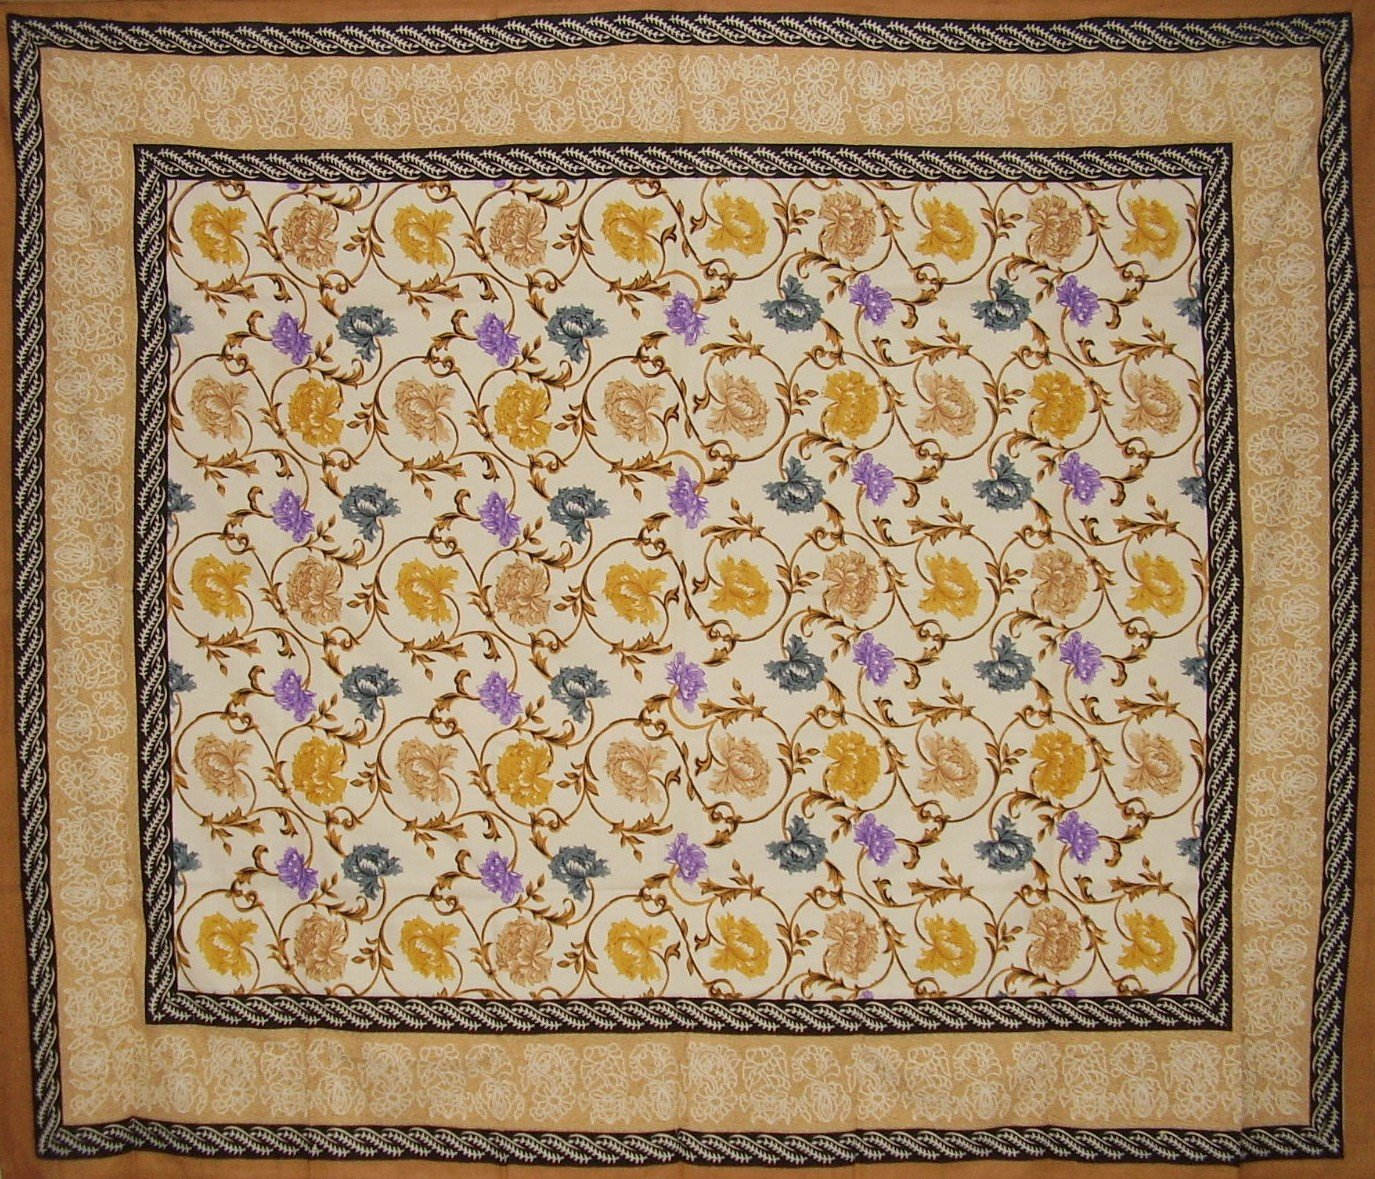 India Arts Mediterranean Floral Tapestry Cotton Bedspread 106 x 88 Full-Queen Tan